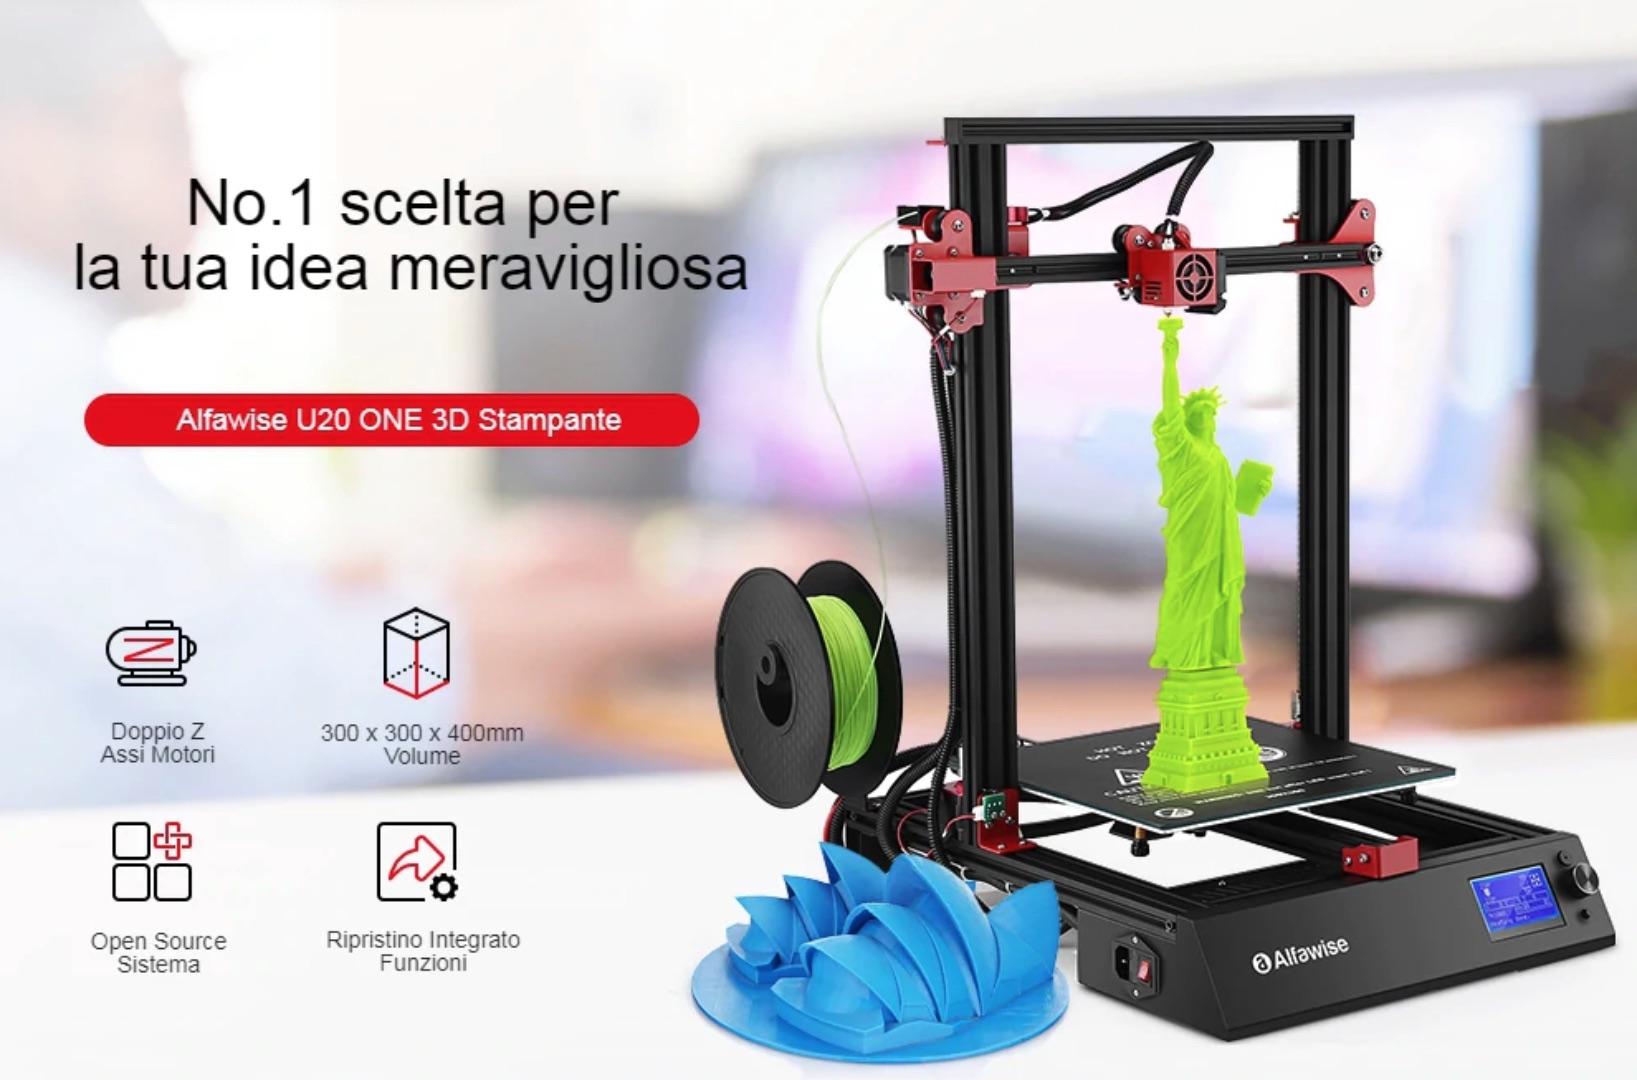 Alfawise U20 Stampante 3D – Gearbest